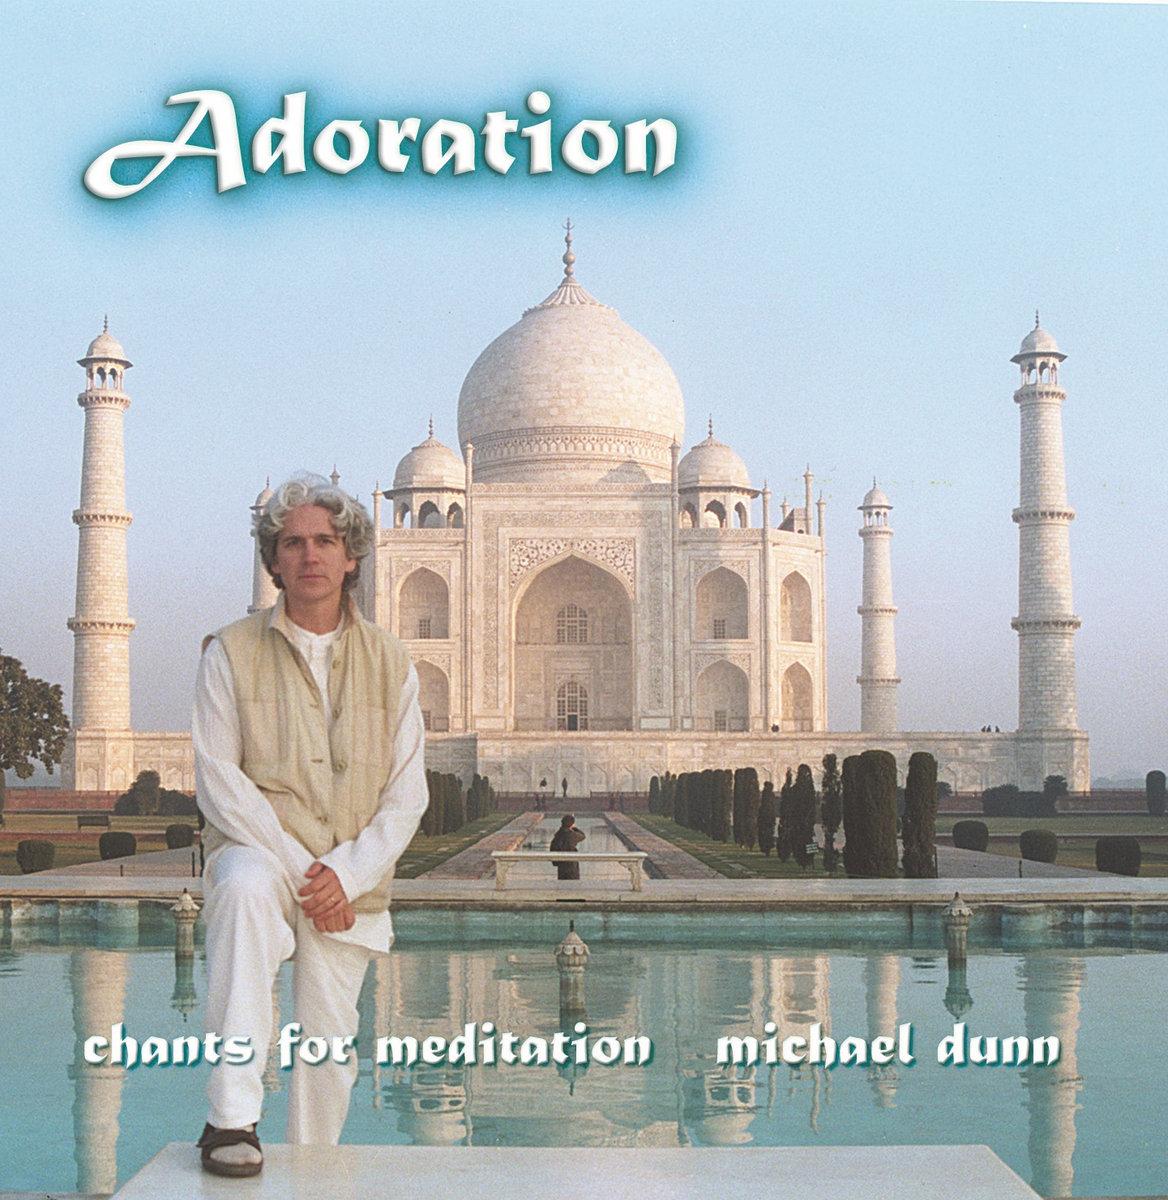 Adoration - Chants for Meditation | Michael Henry Dunn